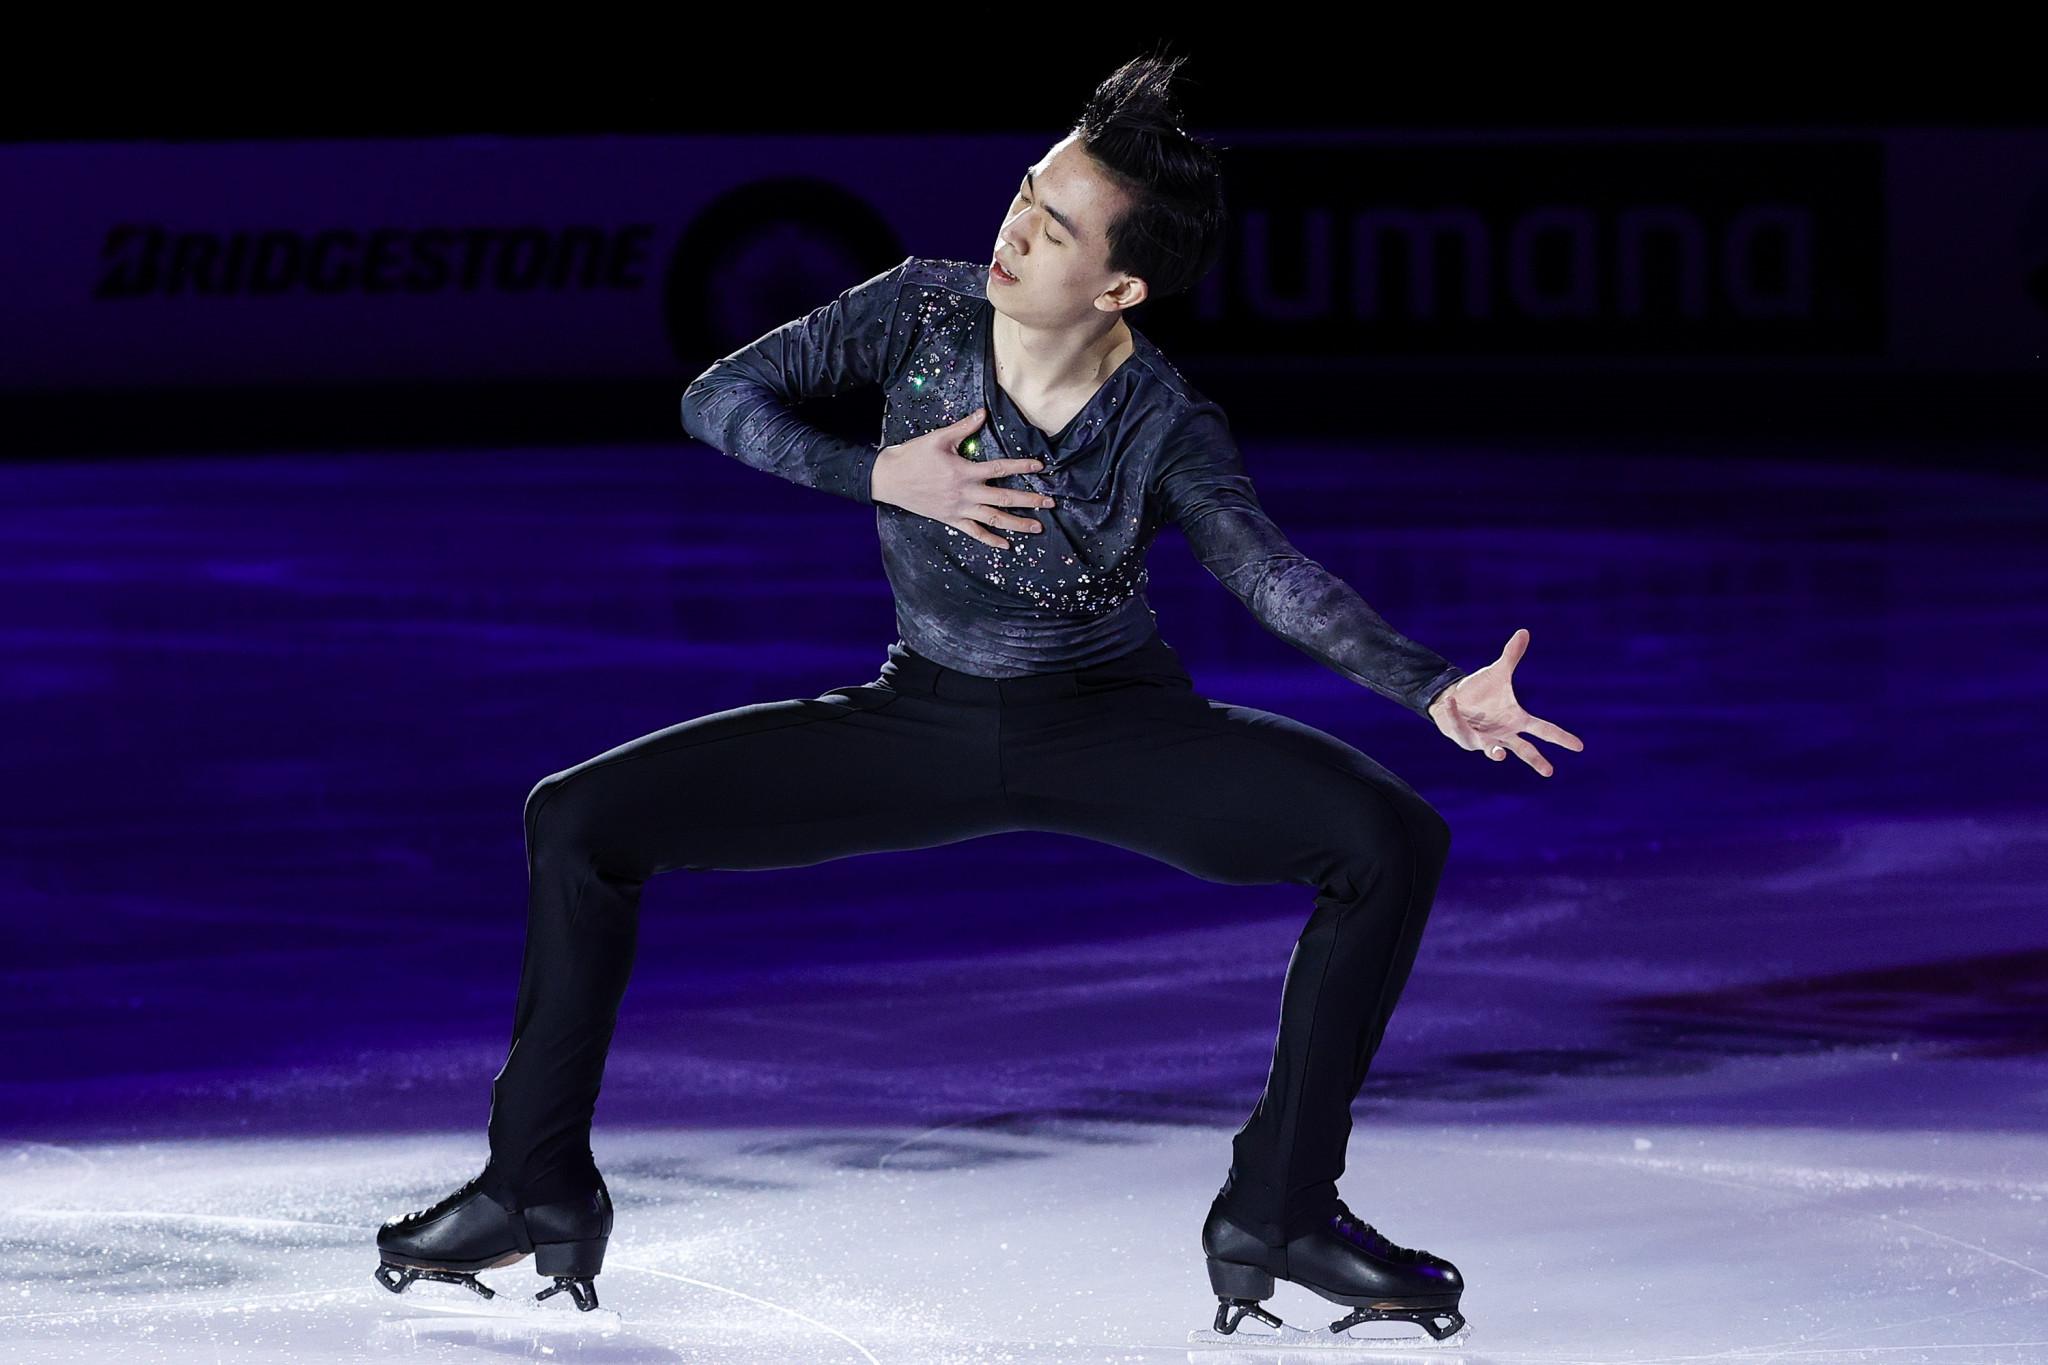 Zhou seals another US spot for Beijing 2022 as ISU confirms COVID case at Nebelhorn Trophy